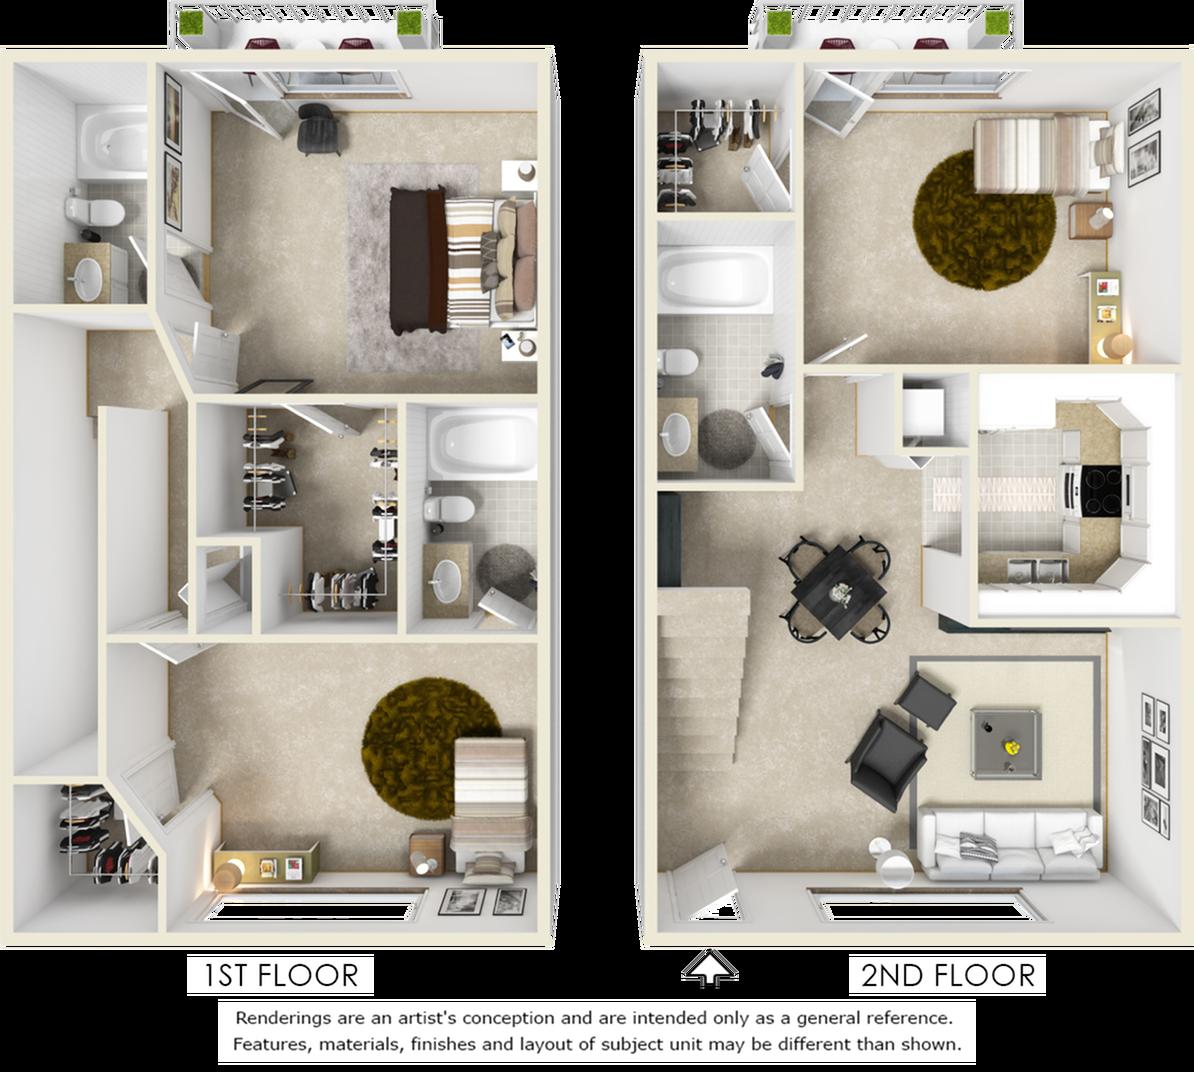 Kensington 3 bedroom 3 bathroom floor plan